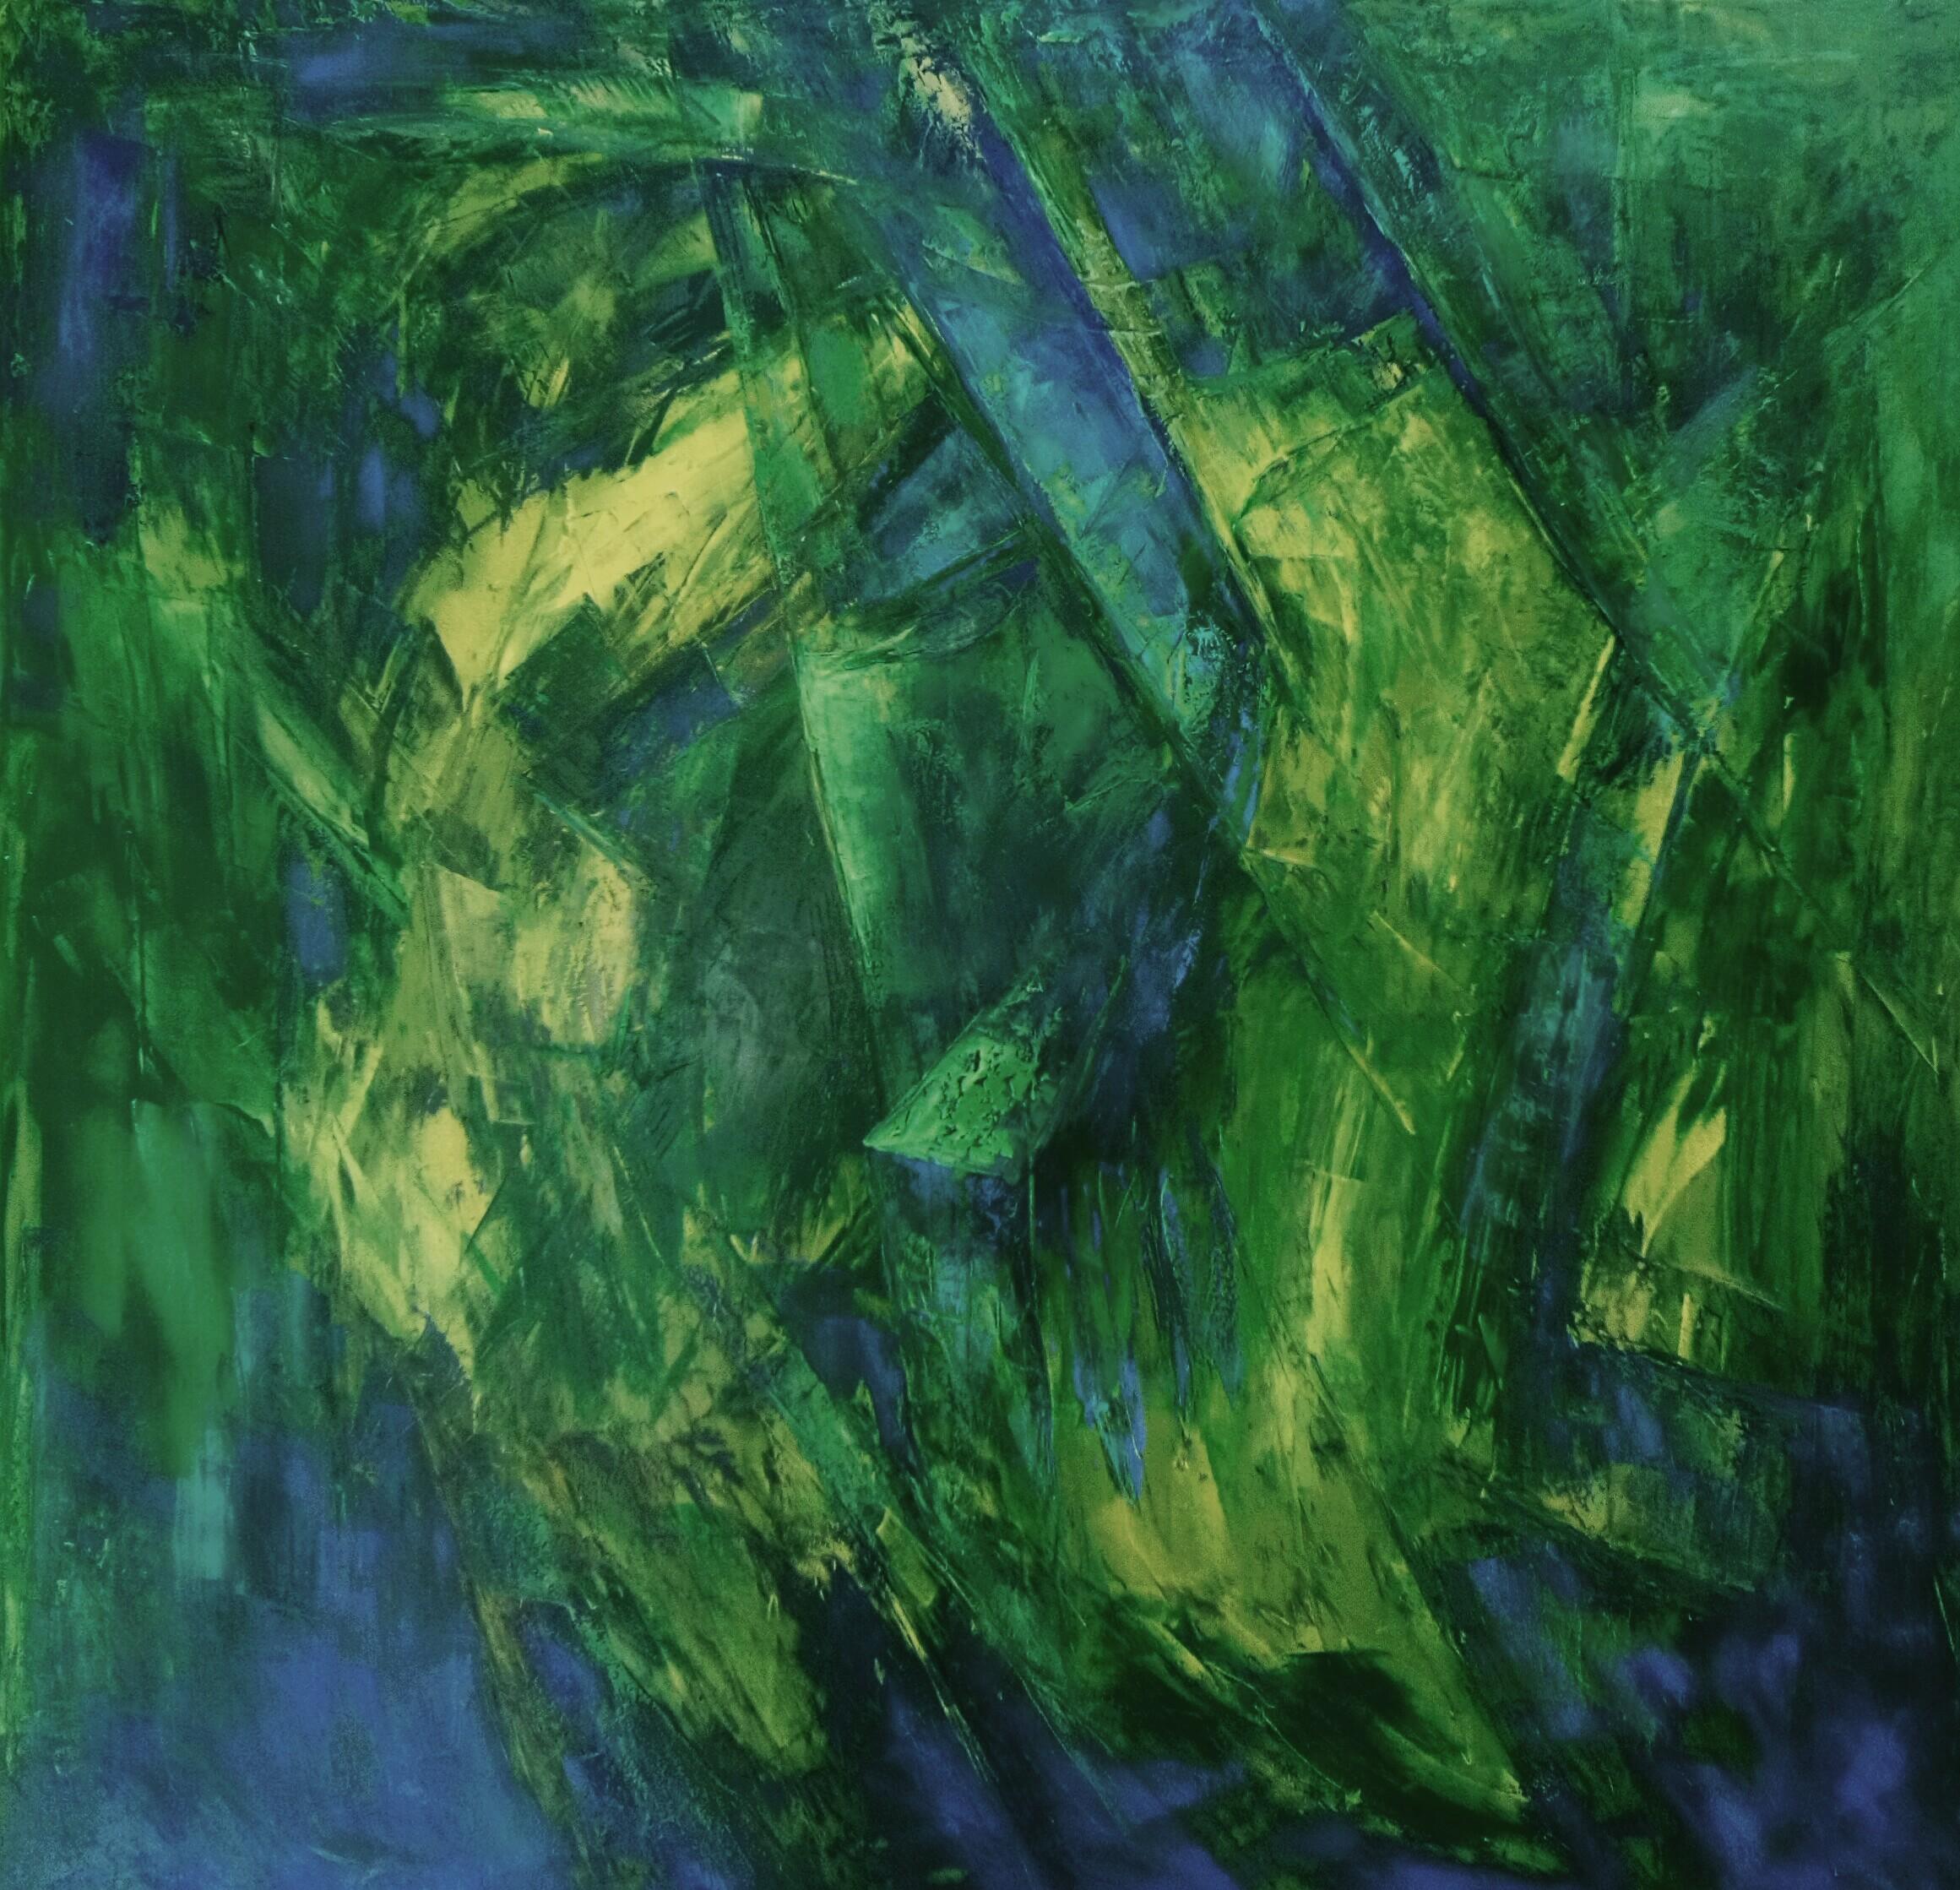 Original Abstract Wall Art by Sigifredo